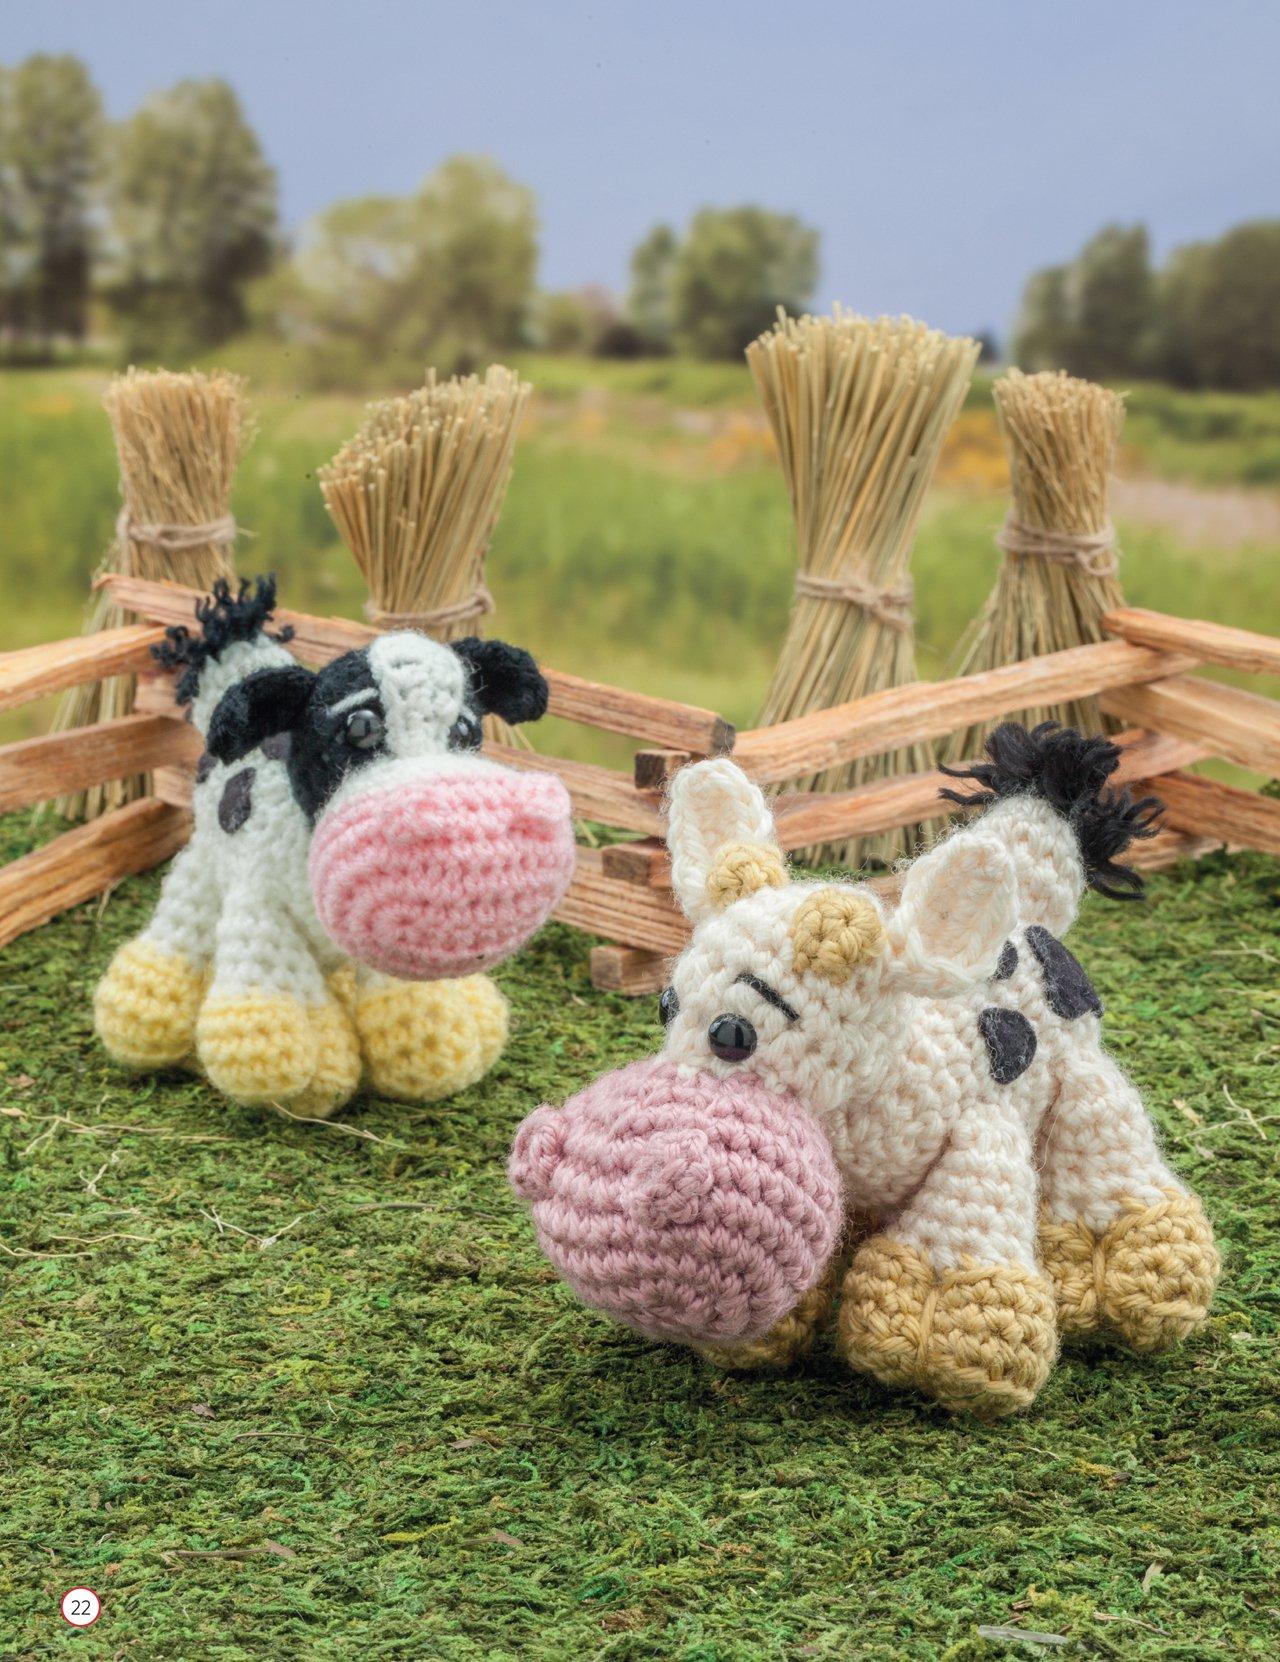 Son's Popkes | Crochet animal patterns designed by Sonja van der Wijk | 1662x1280